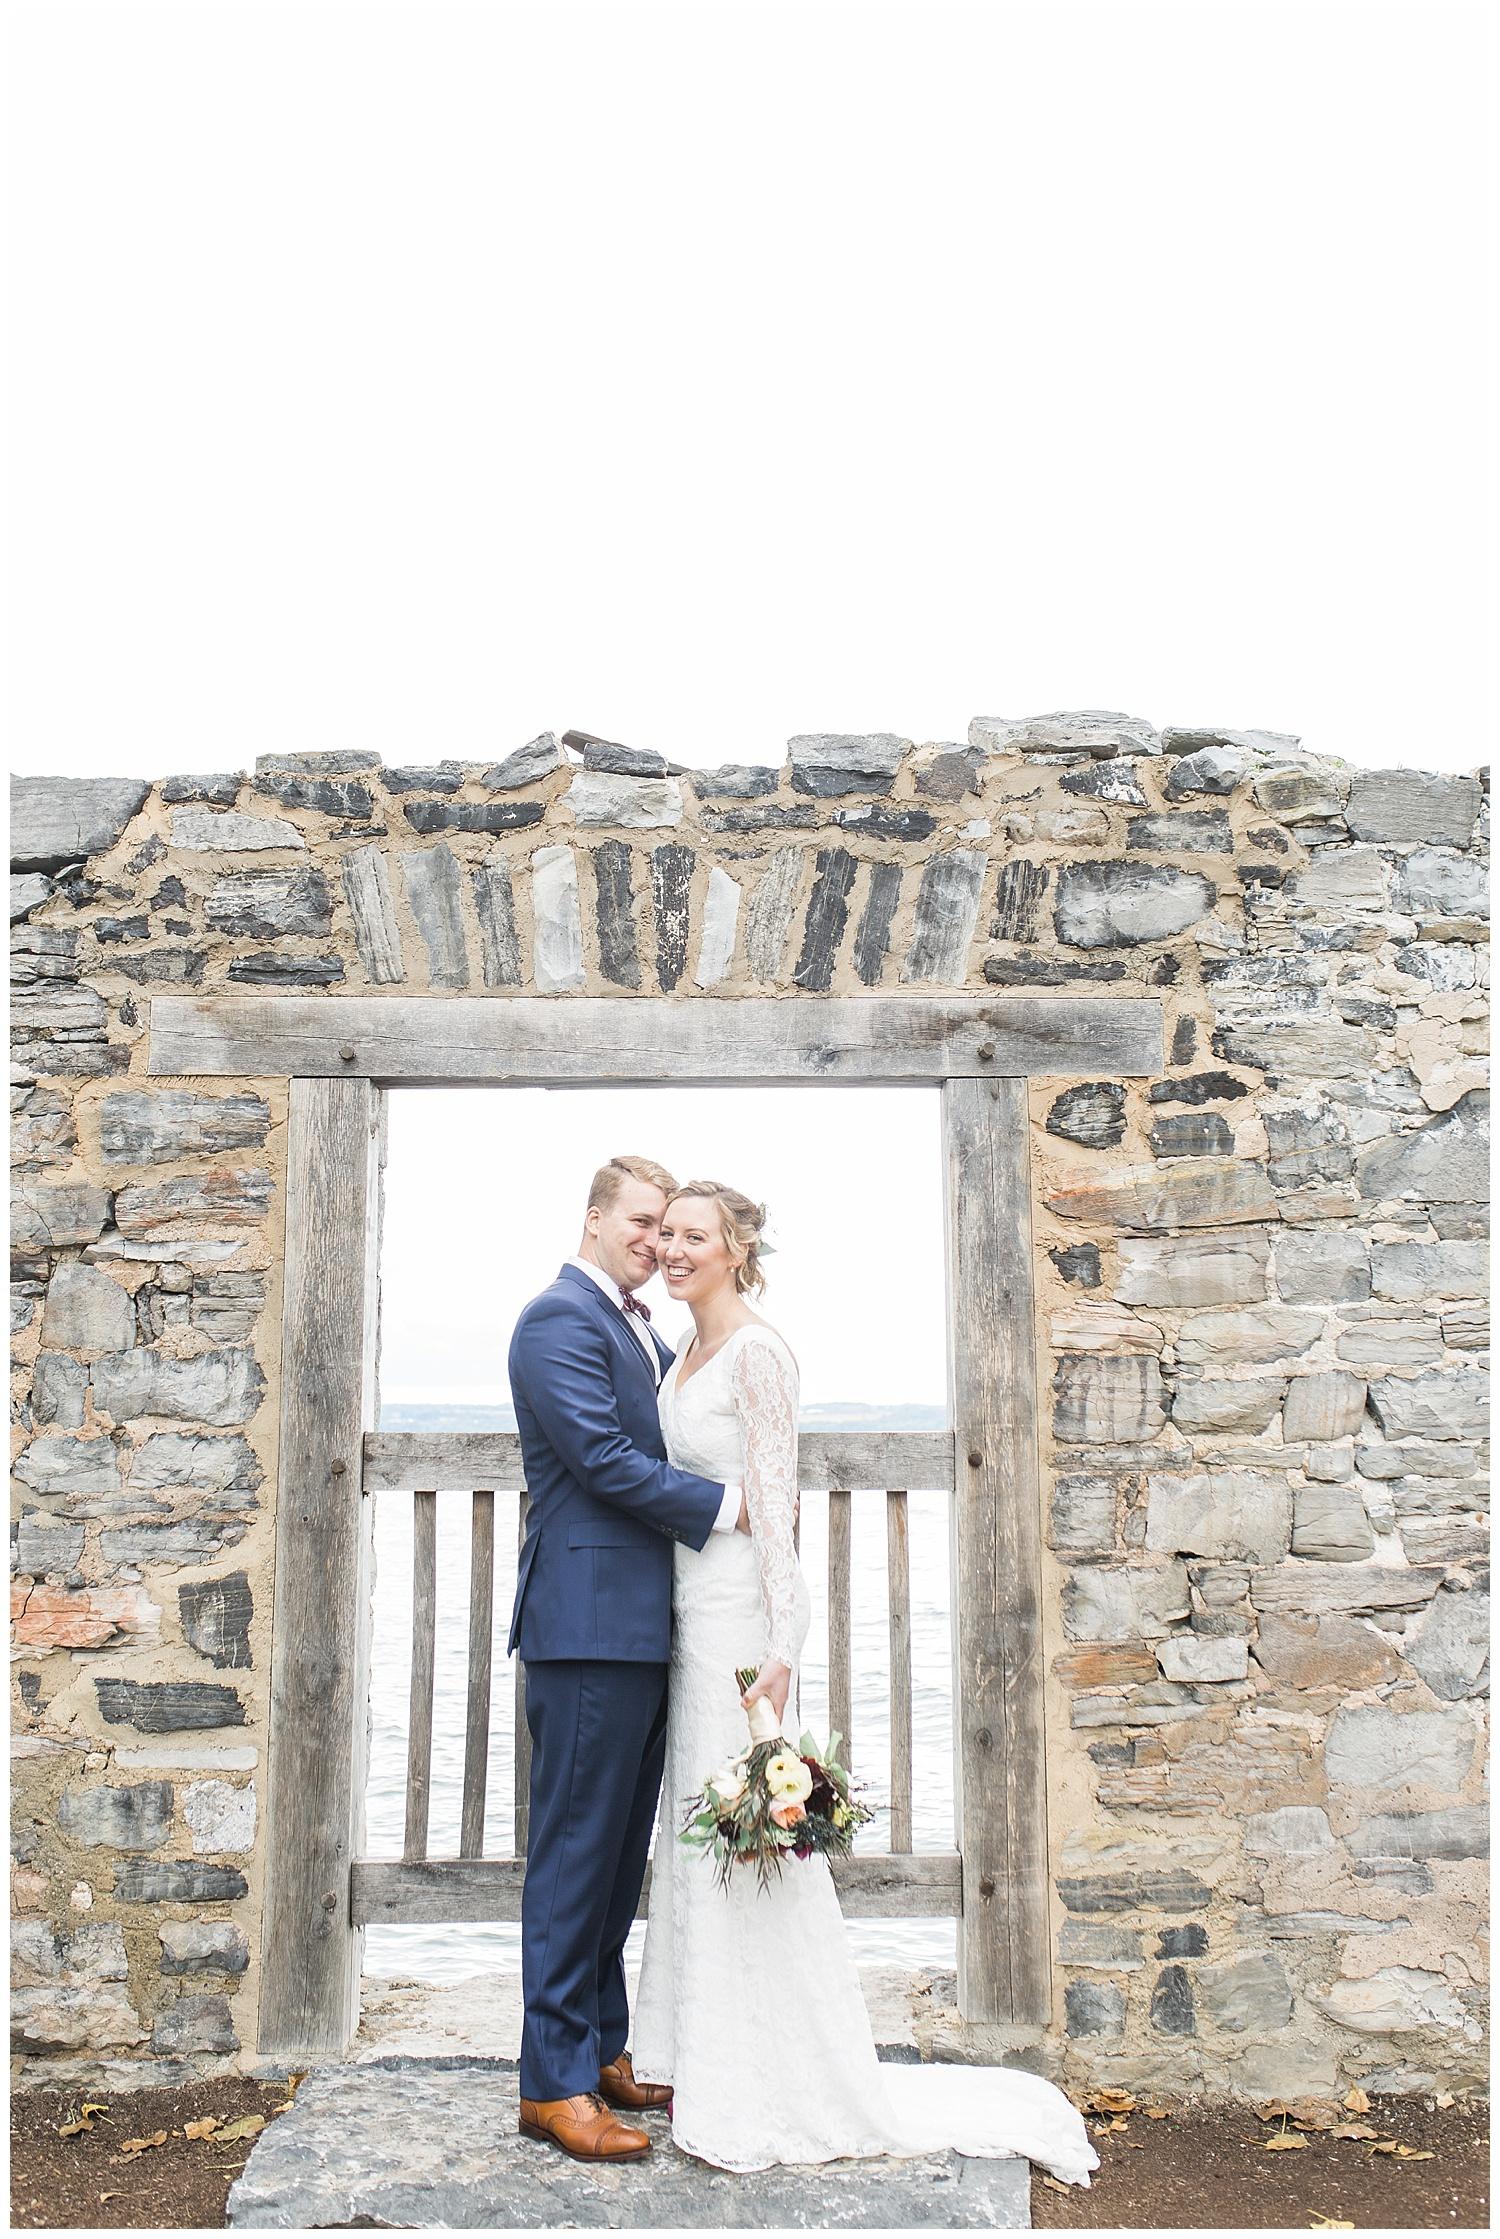 Margaret and Colin - Inns of Aurora - Lass and Beau-818_Buffalo wedding photography.jpg